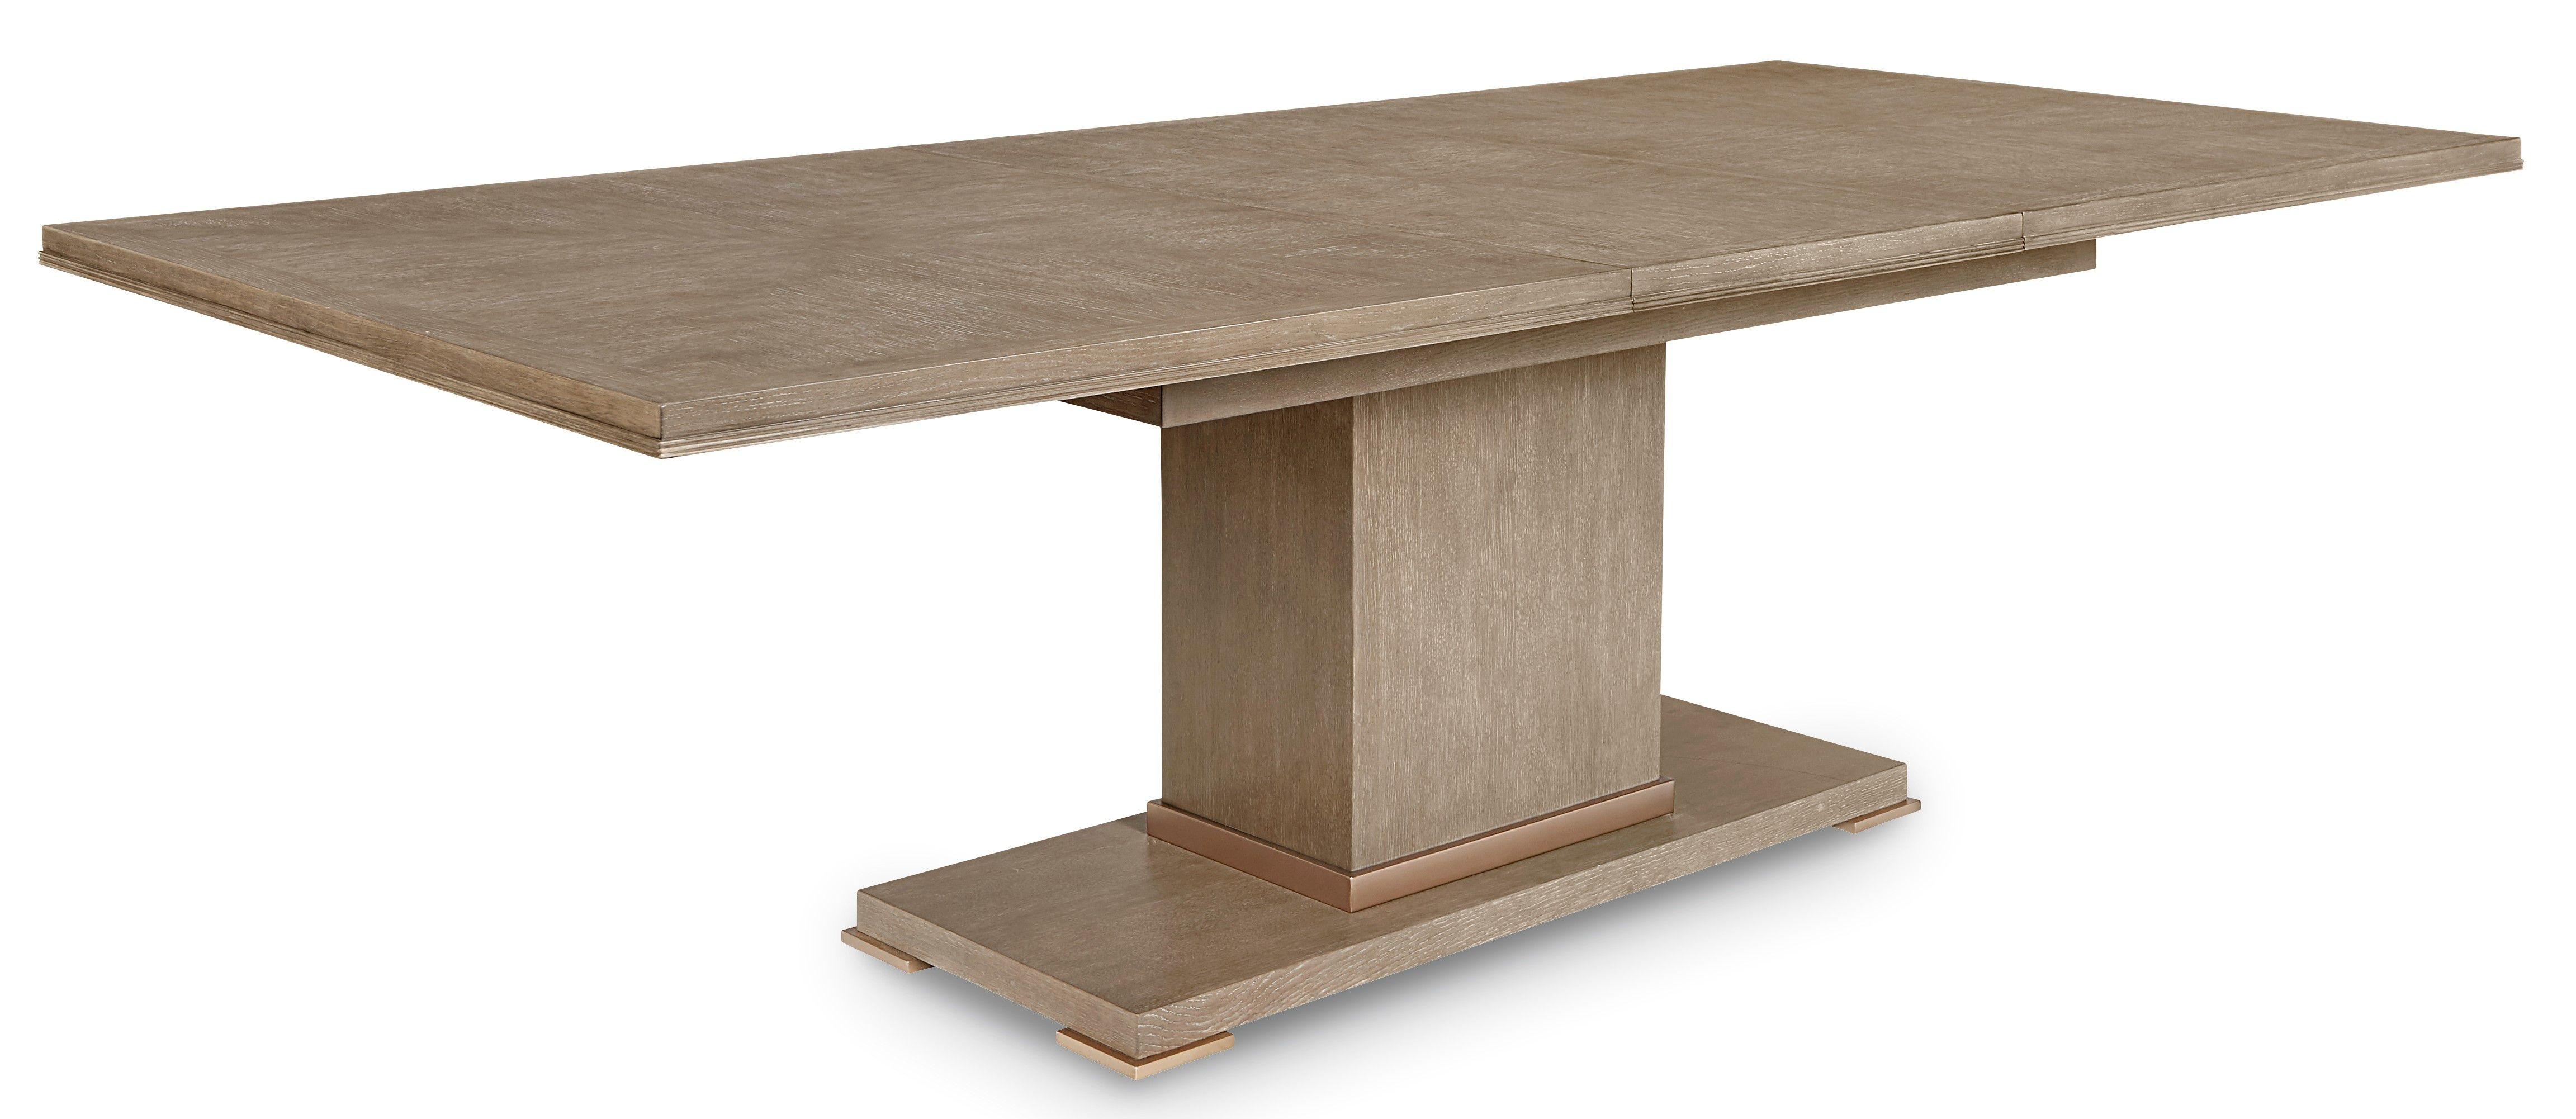 ART Furniture Dining Room Belfort Rectangular Dining Table BASE  232221 2323BS At Carol House Furniture